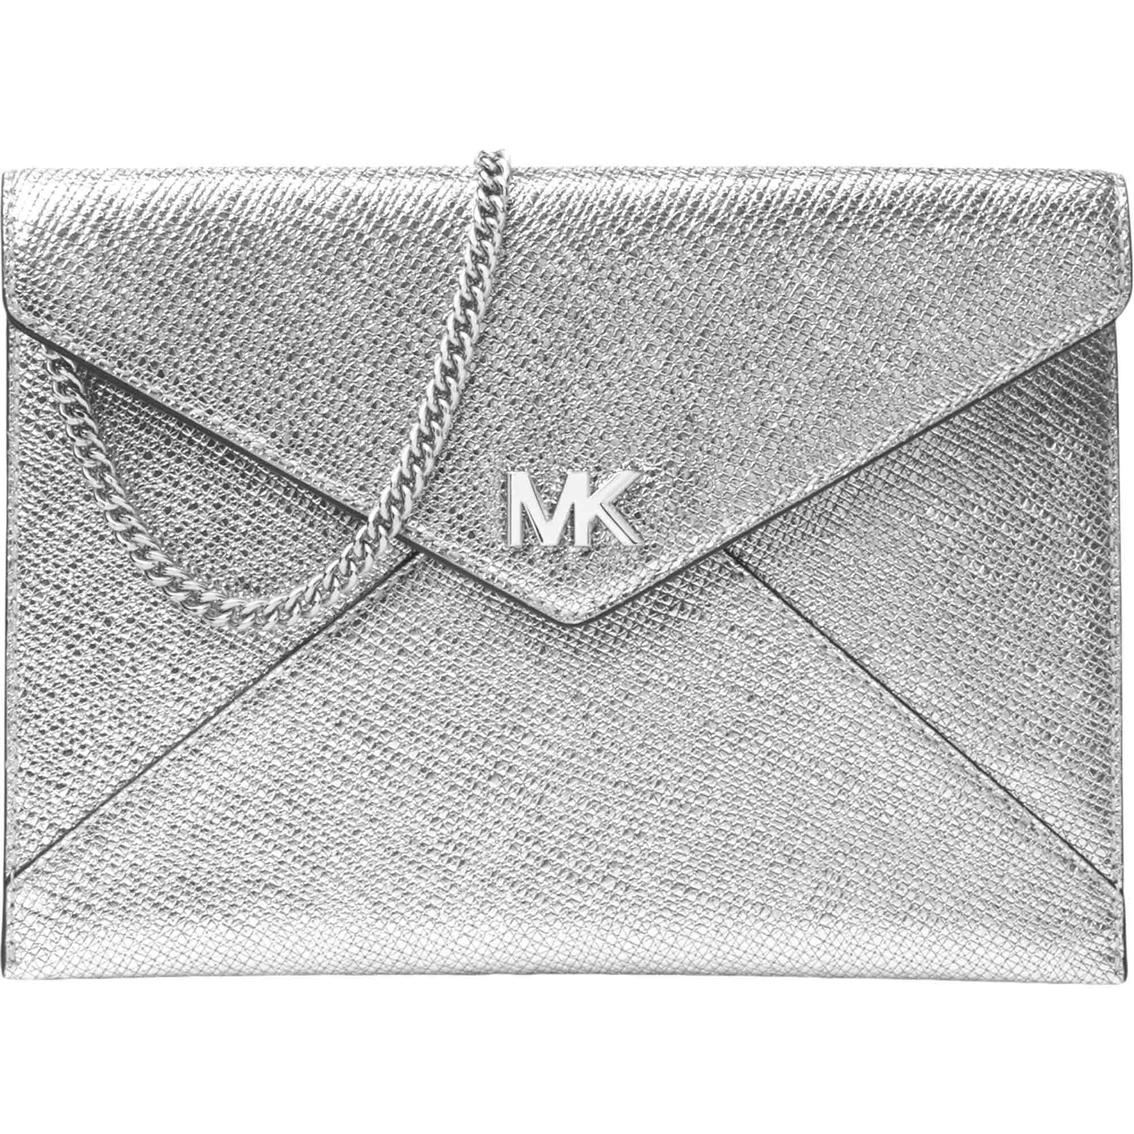 e200add87e67 Michael Kors Barbara Medium Soft Envelope Clutch